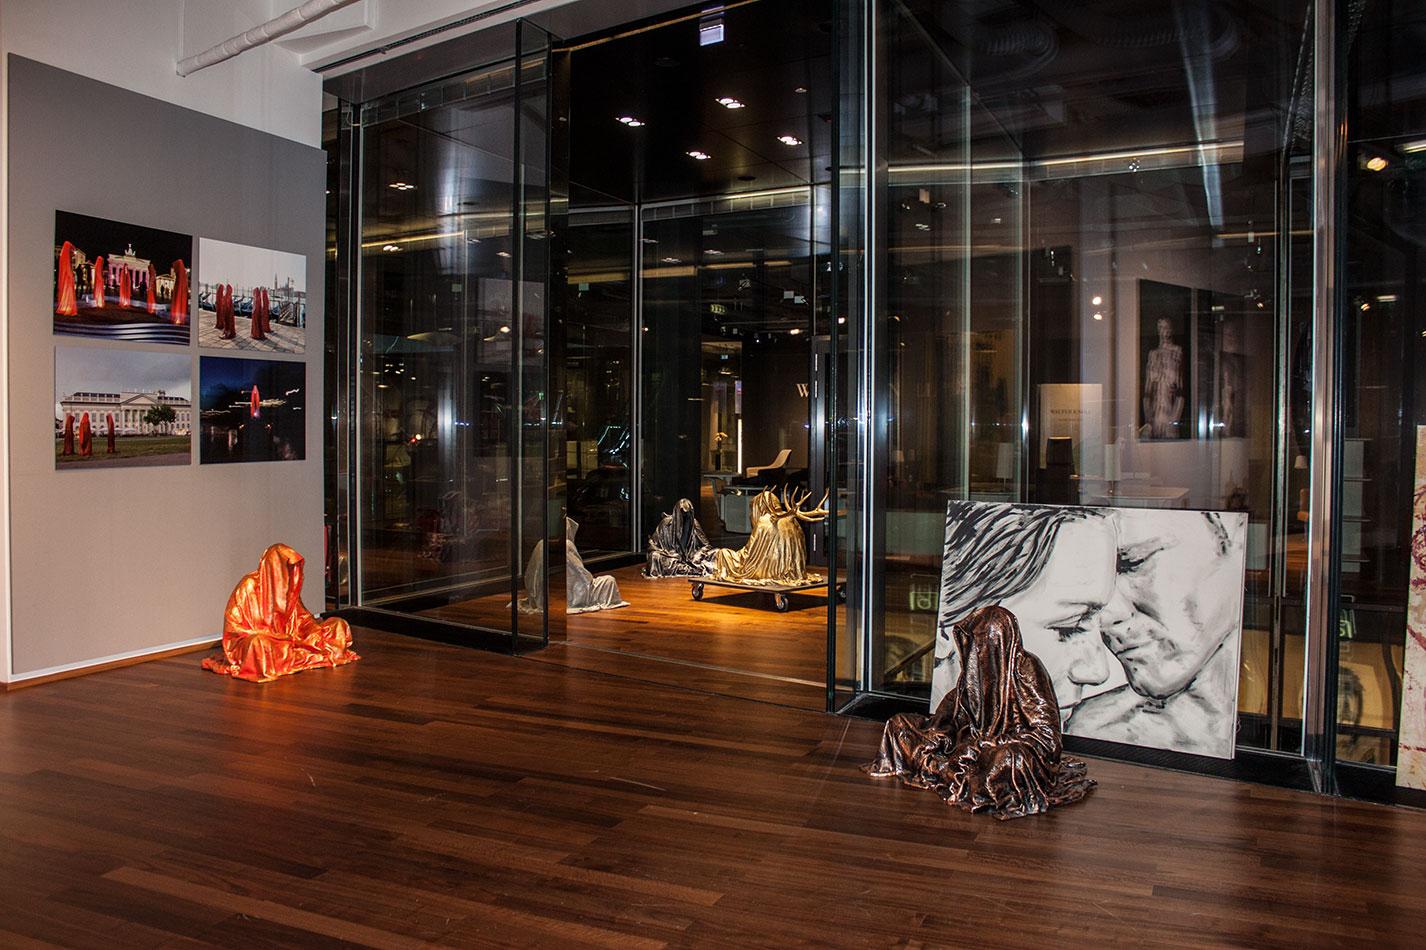 stilwerk-wien-designtower-vienna-show-guardians-of-time-waechter-der-zeit-manfred-kielnhofer-modern-contemporary-fine-art-design-sculpture-3d-arts-3936